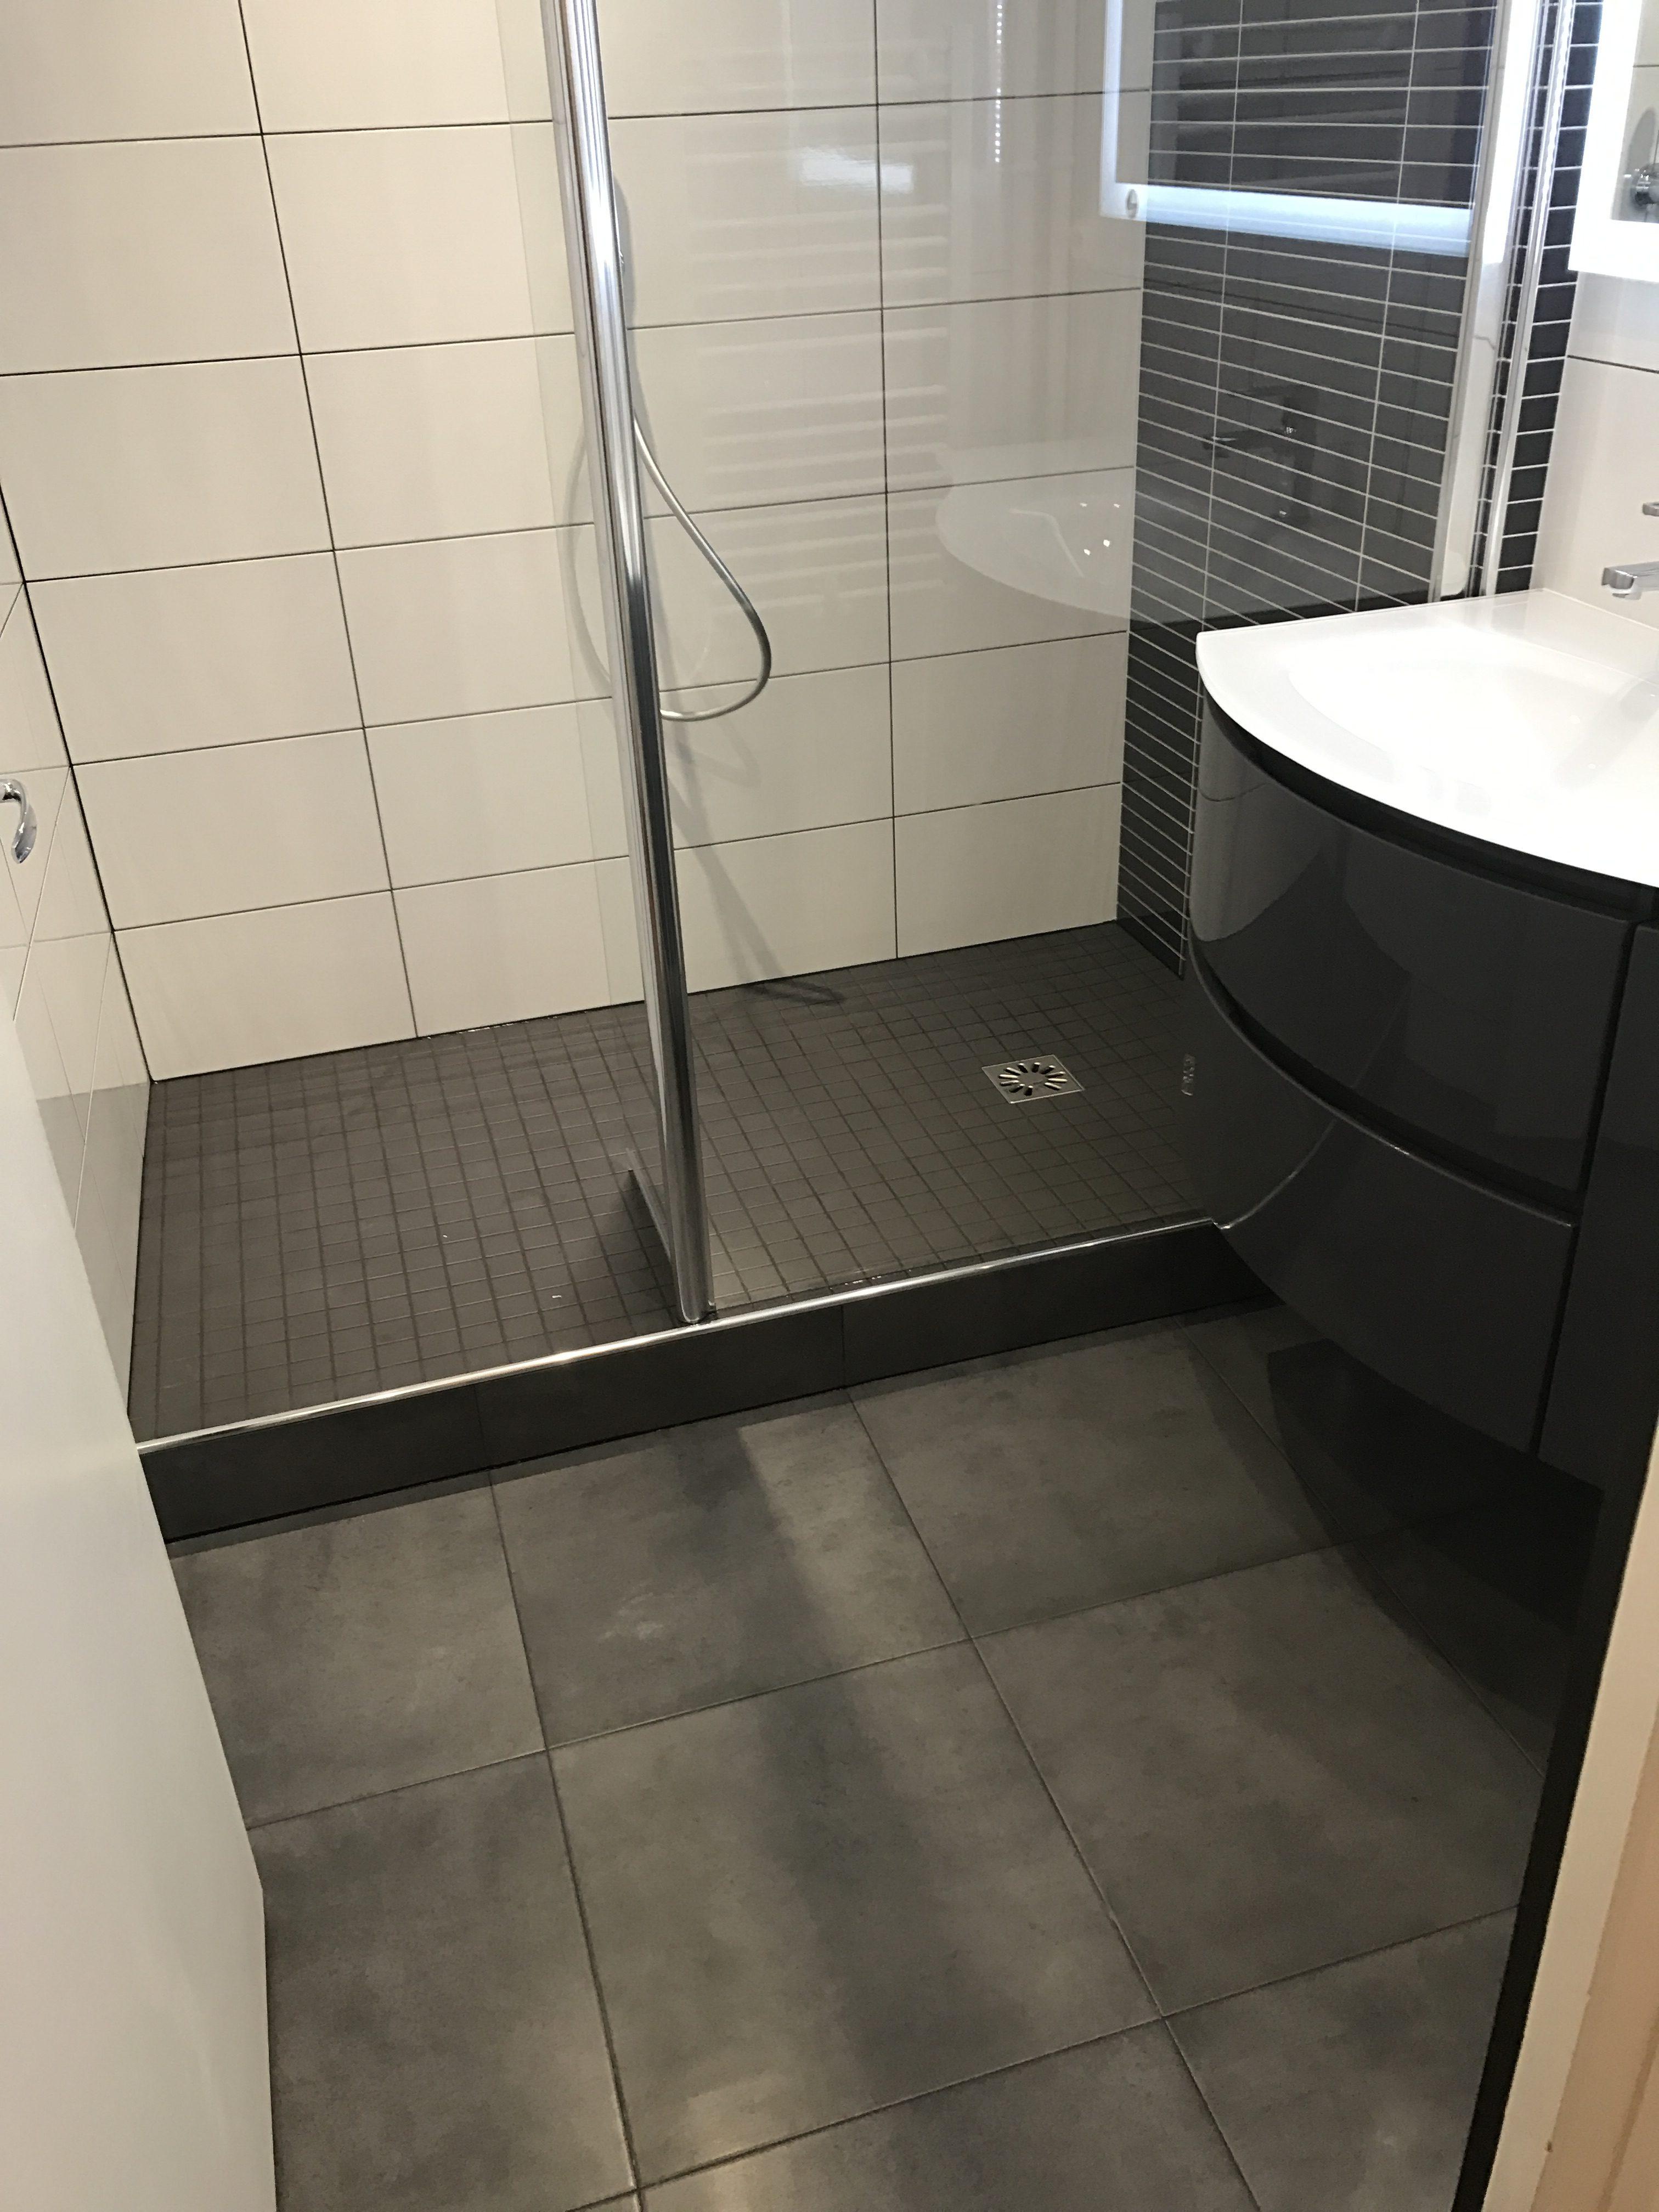 realisation-salle-de-bain-lcrdp-renovation-orleans-6